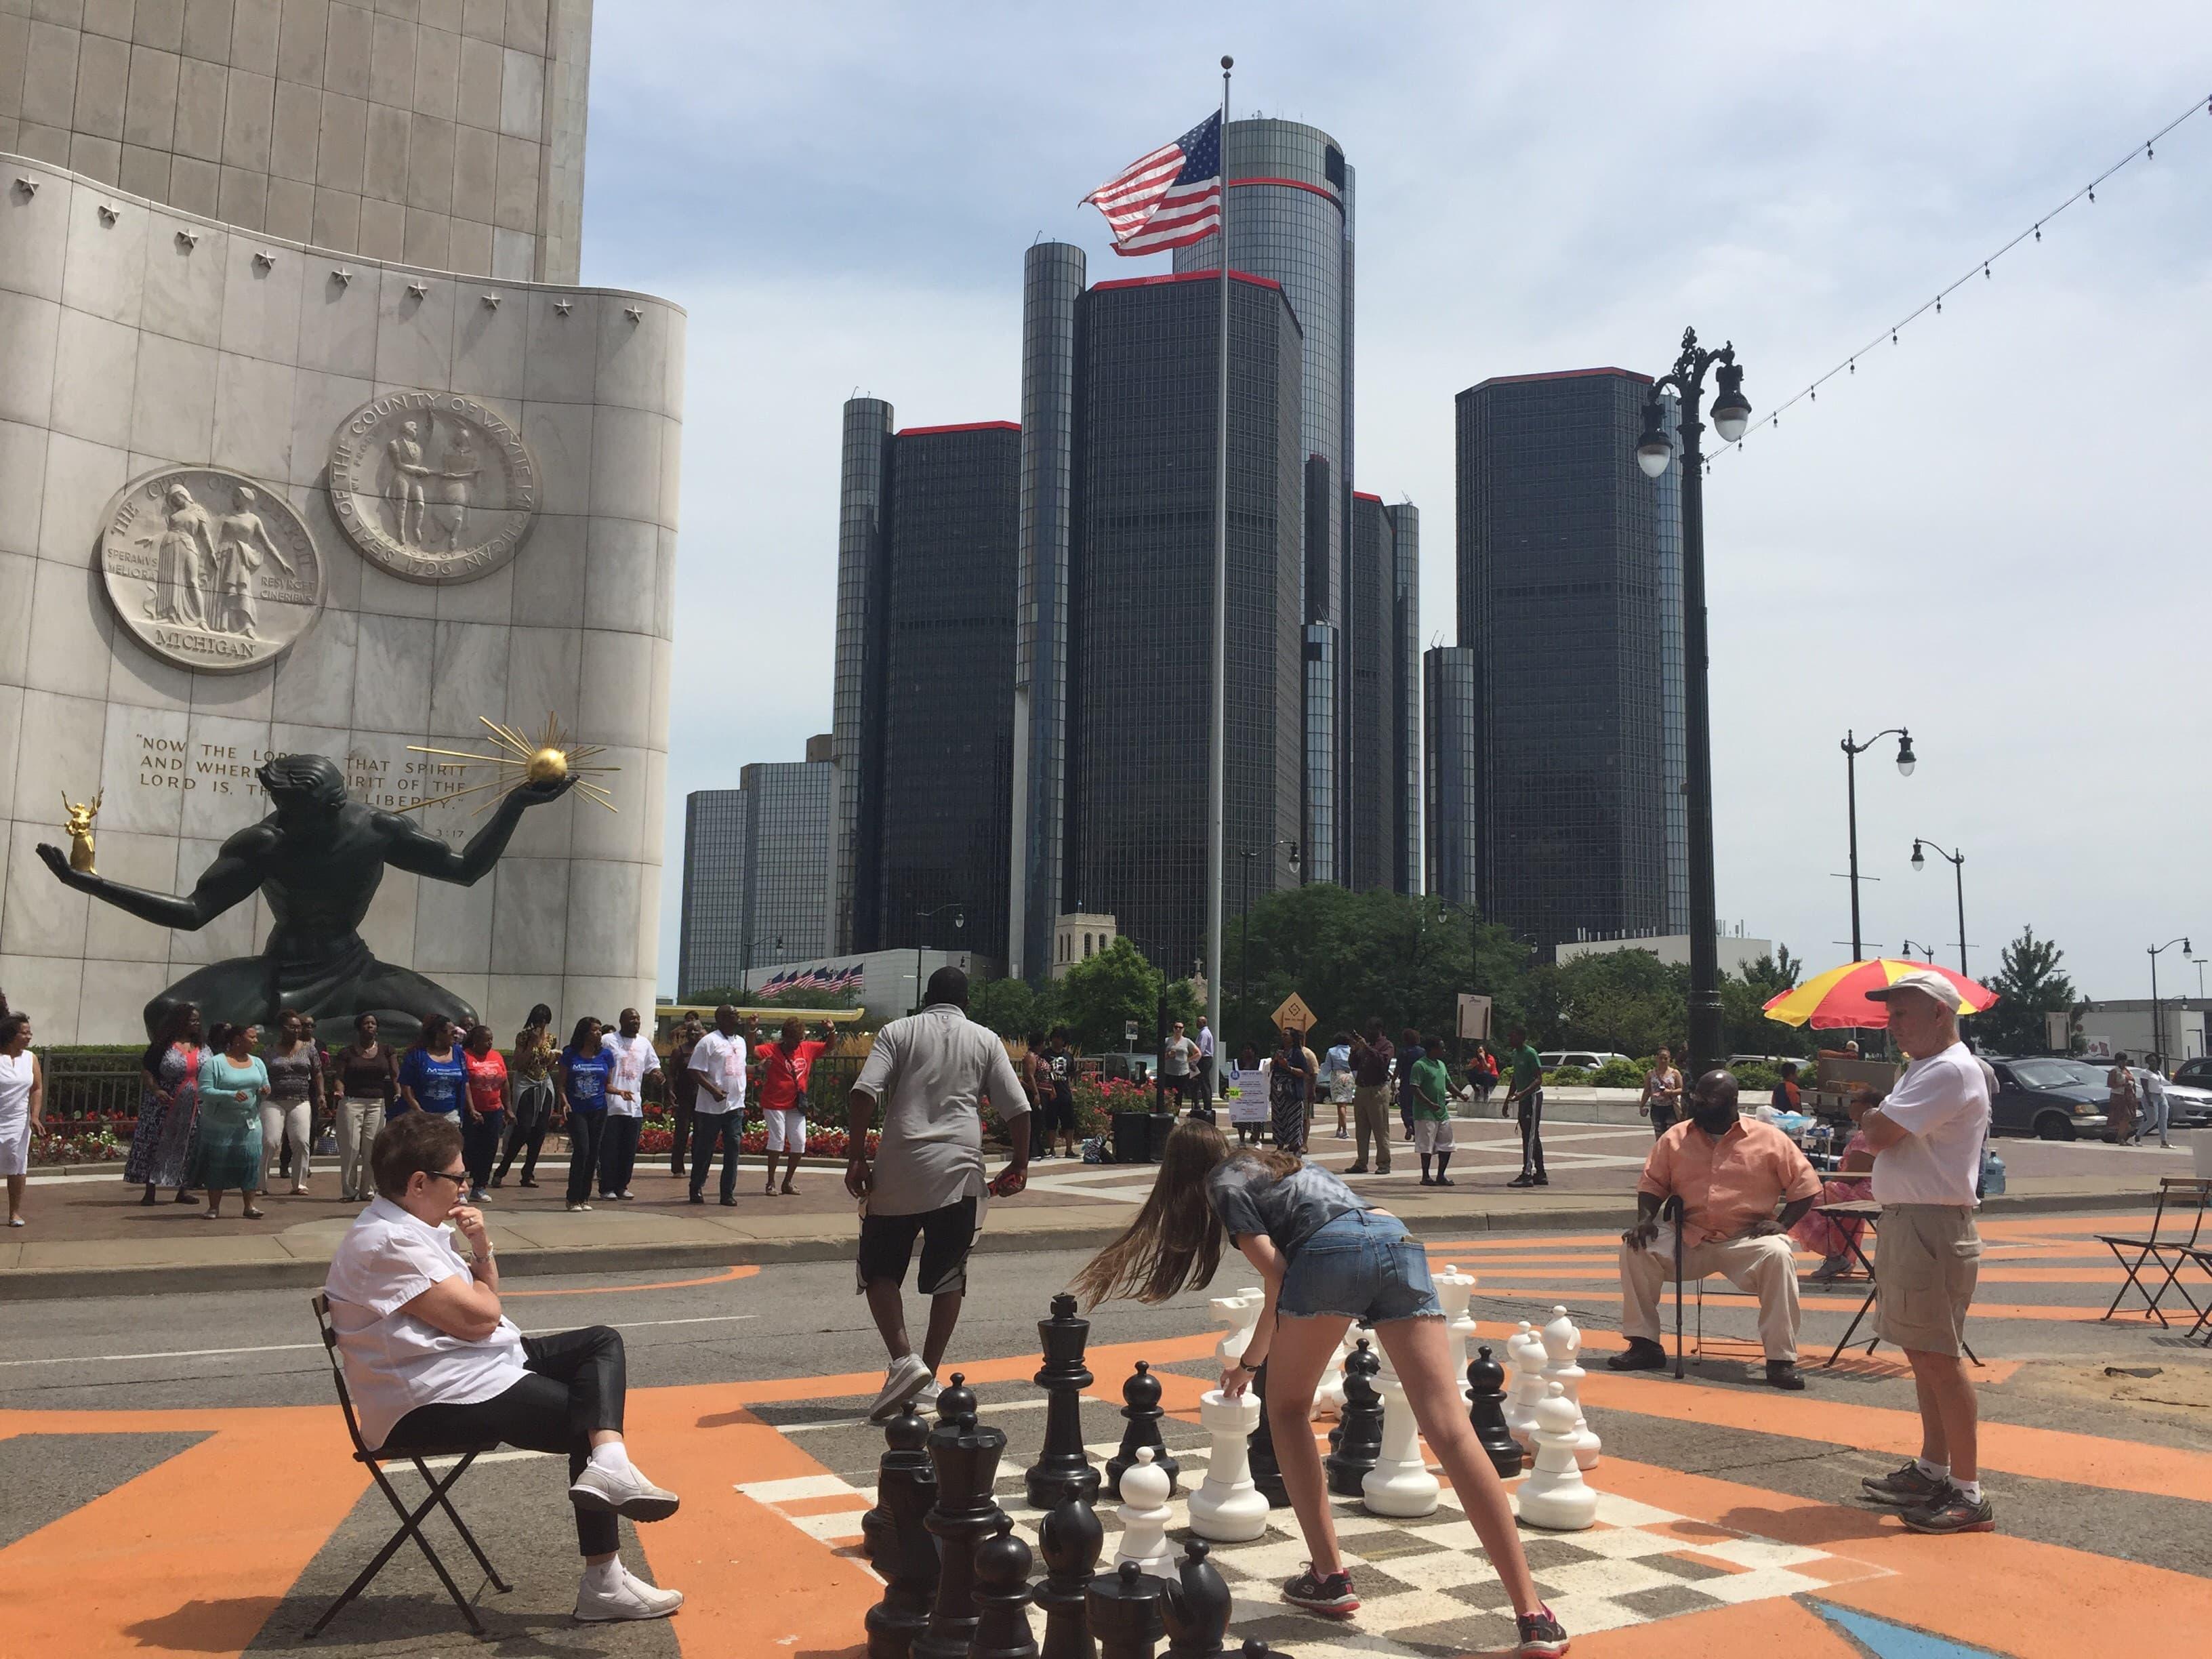 Impact of the Spirit Plaza in Detroit